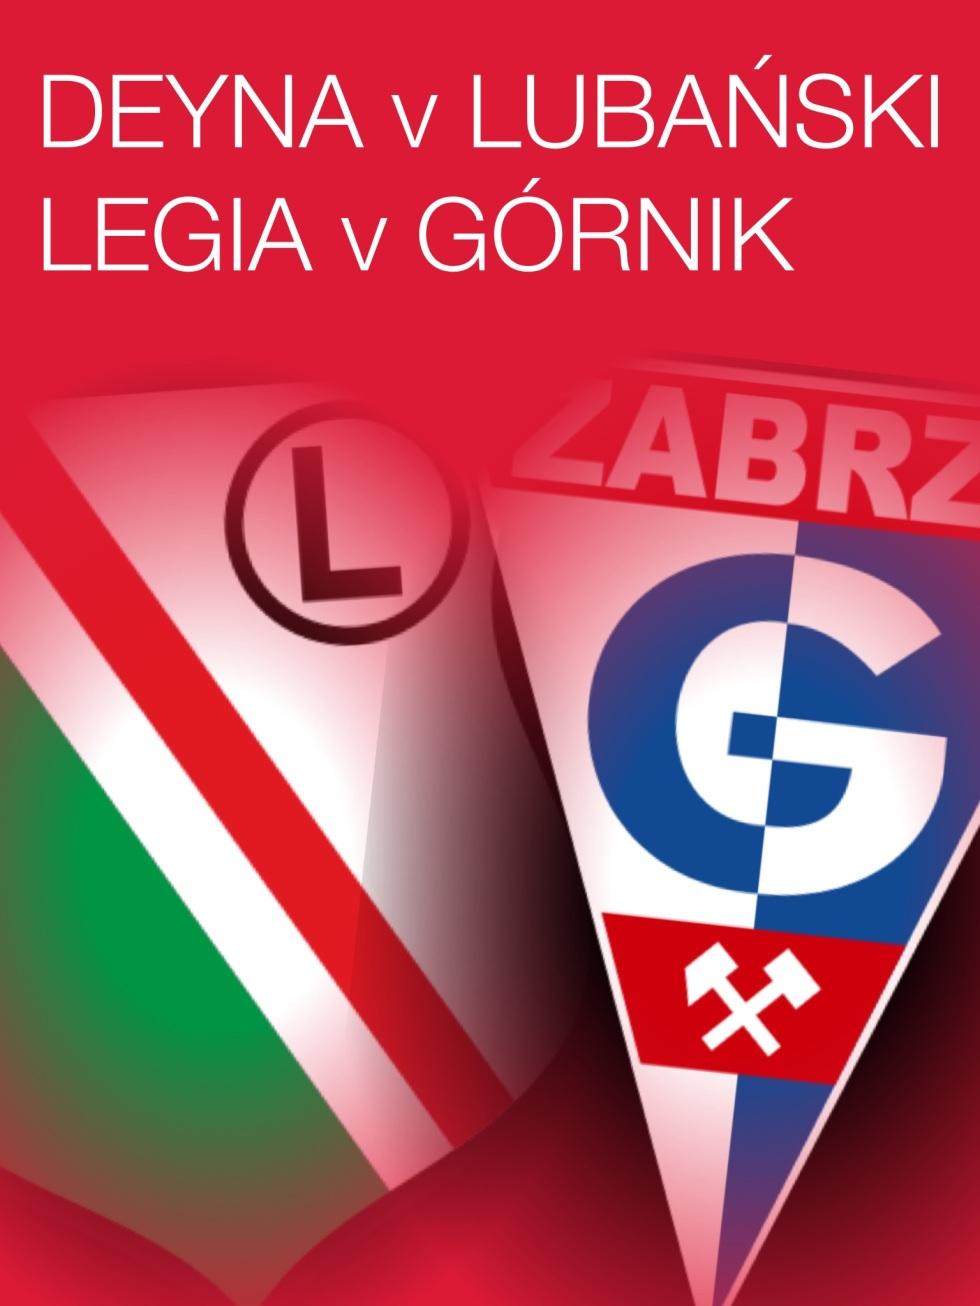 Deyna v Lubański, Legia v Górnik - Part Two